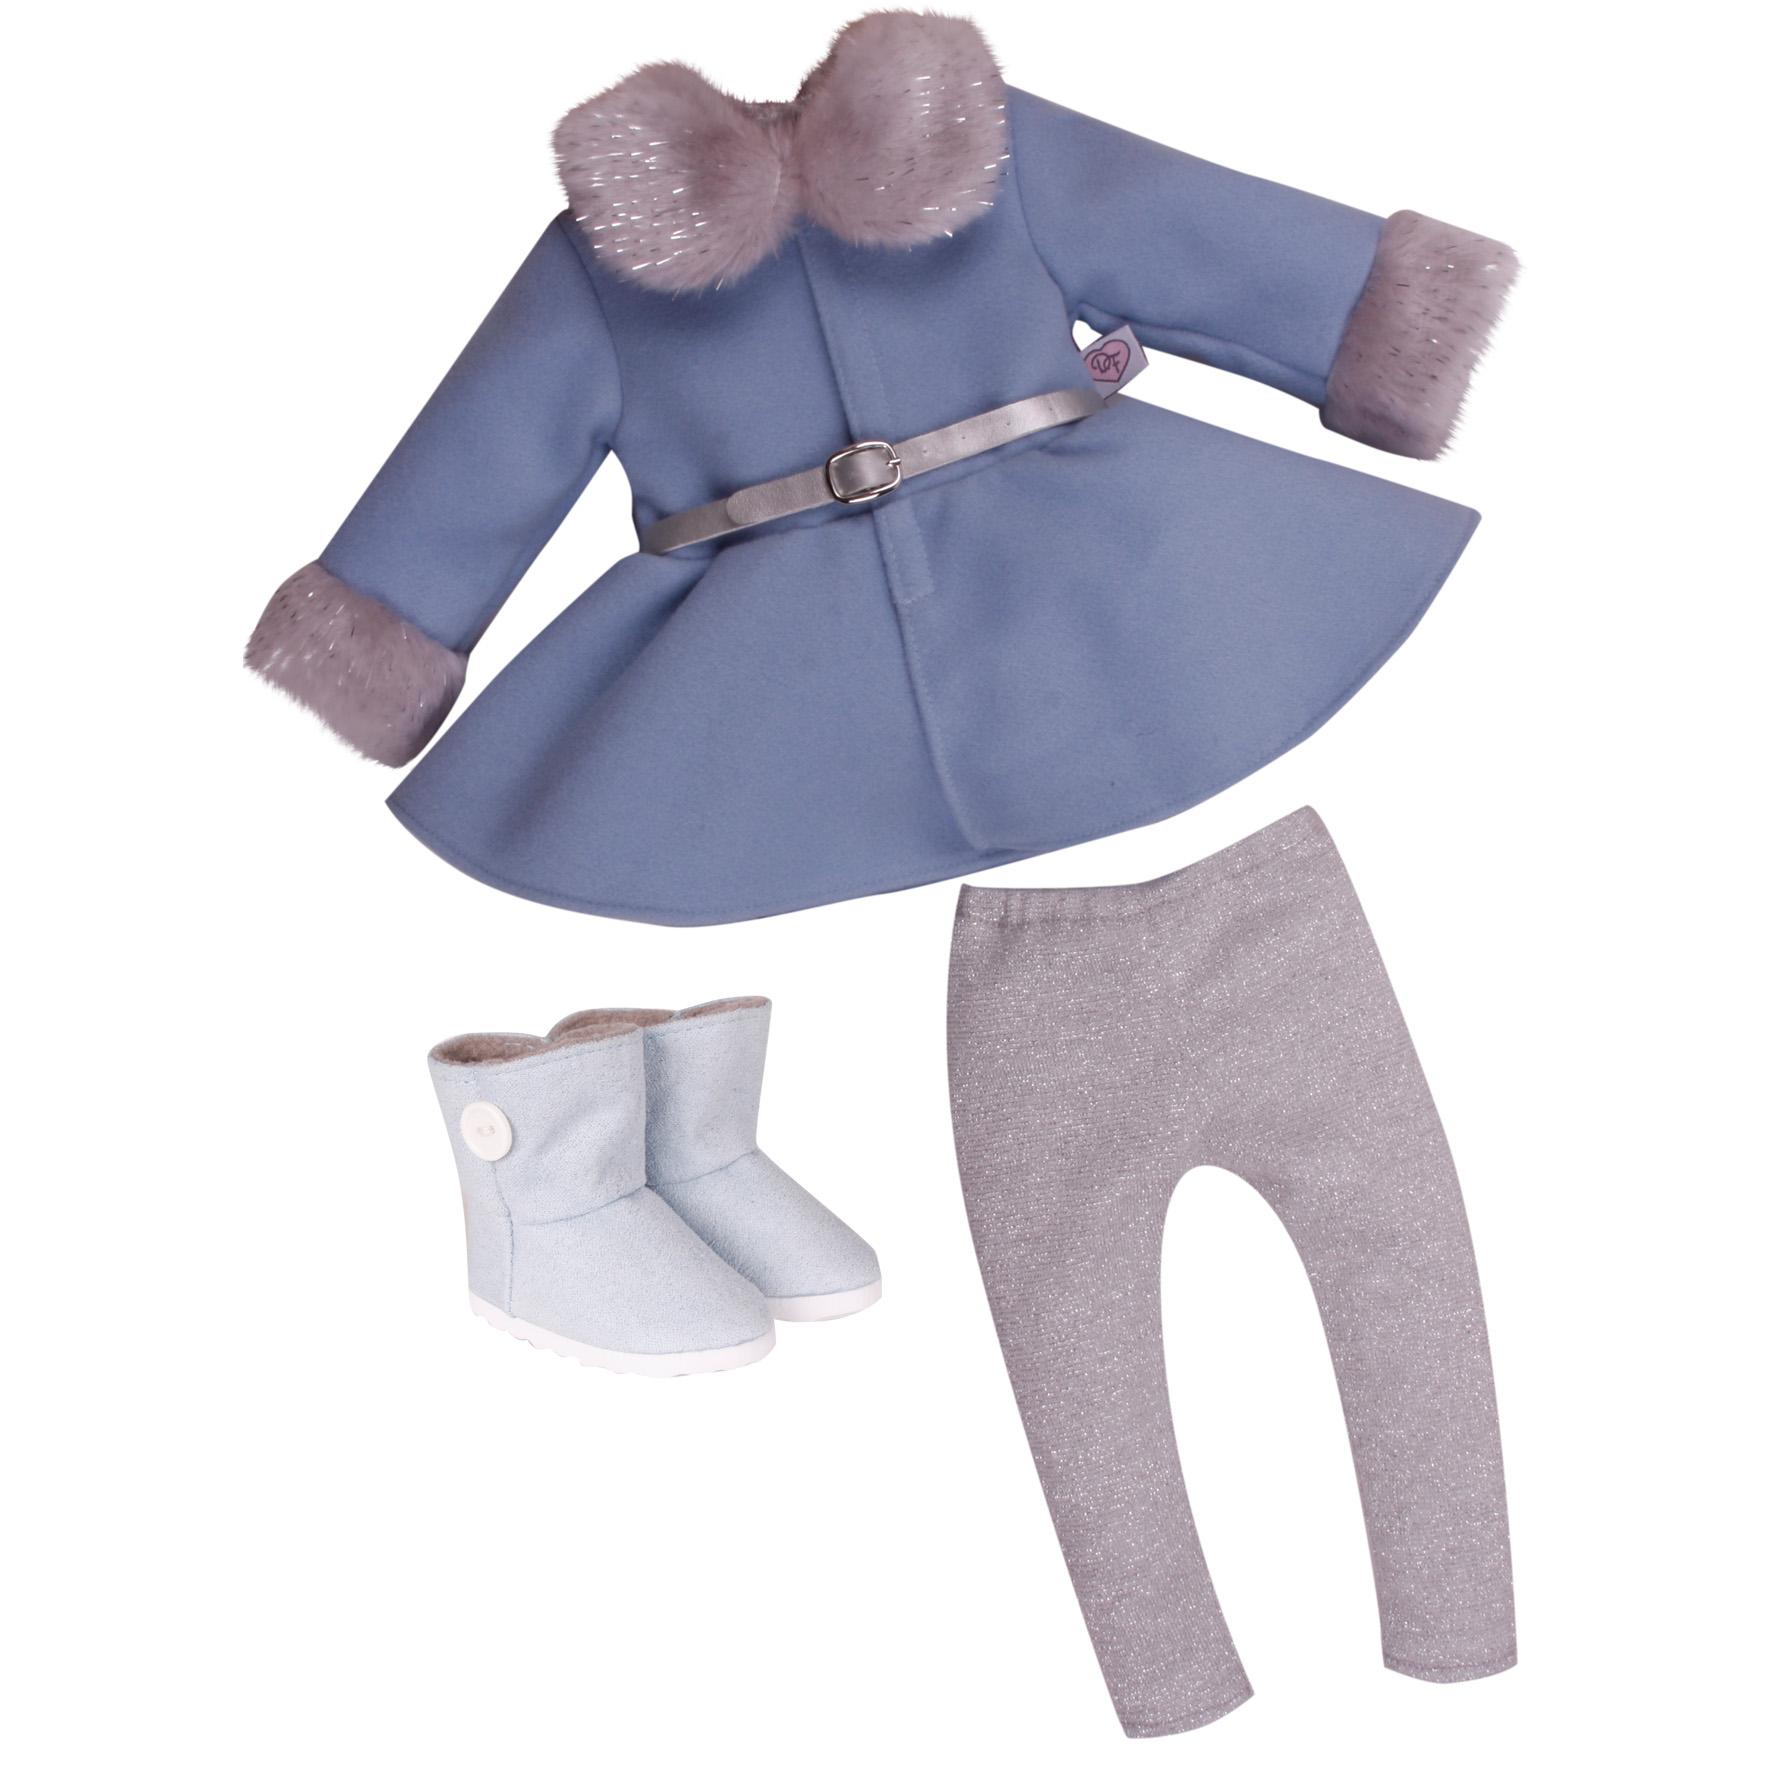 Design a Friend, Winter Wonderland outfit